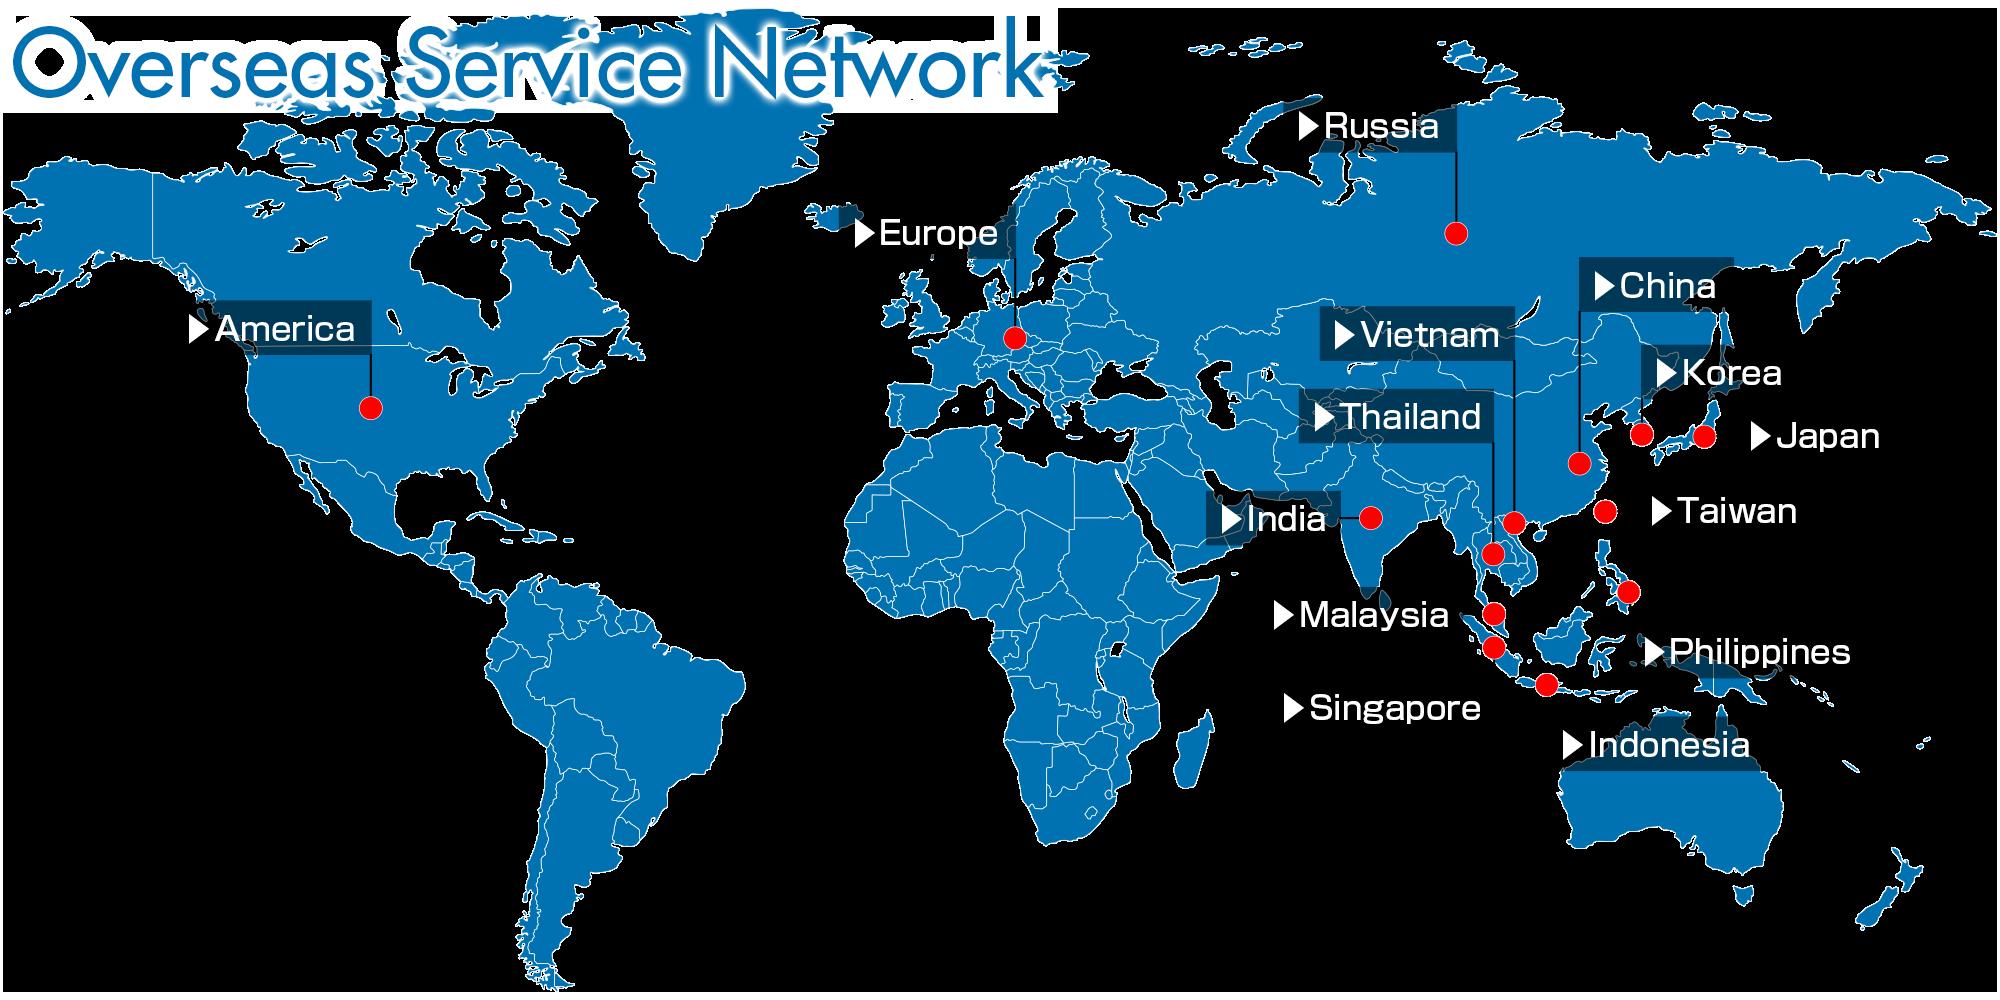 Overseas Service Network